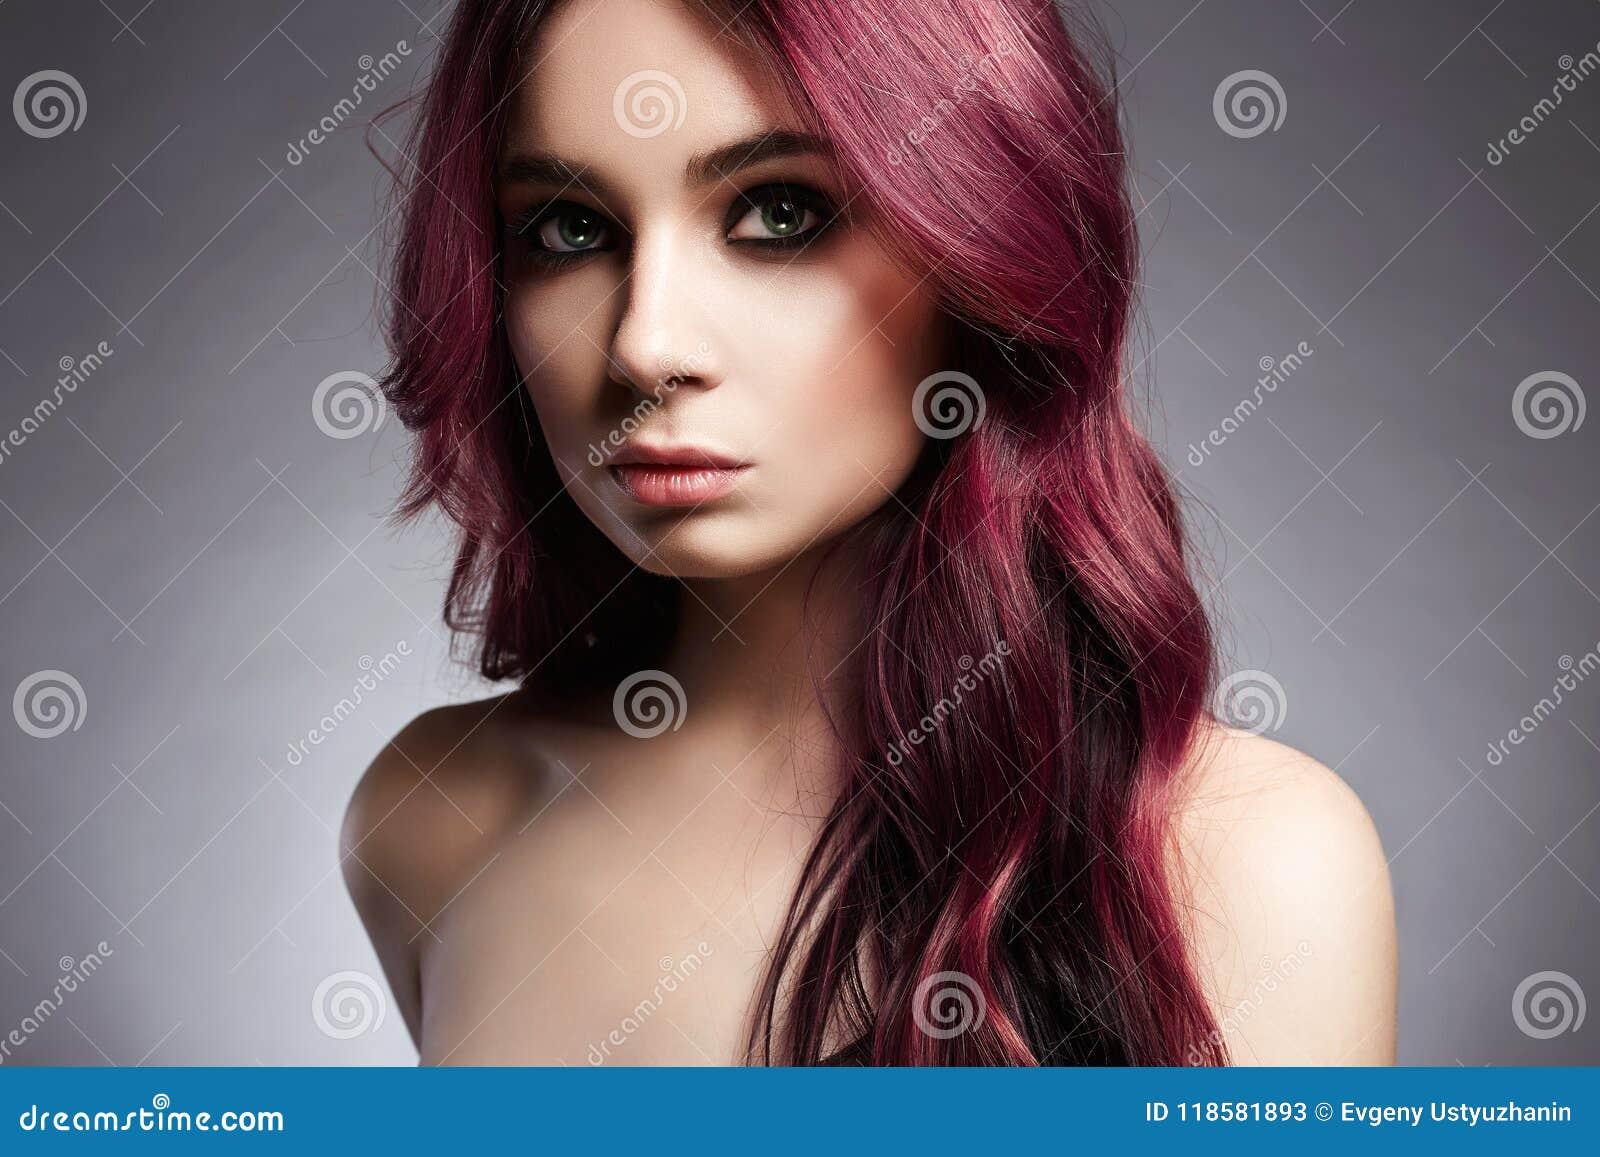 How to make hair beautiful